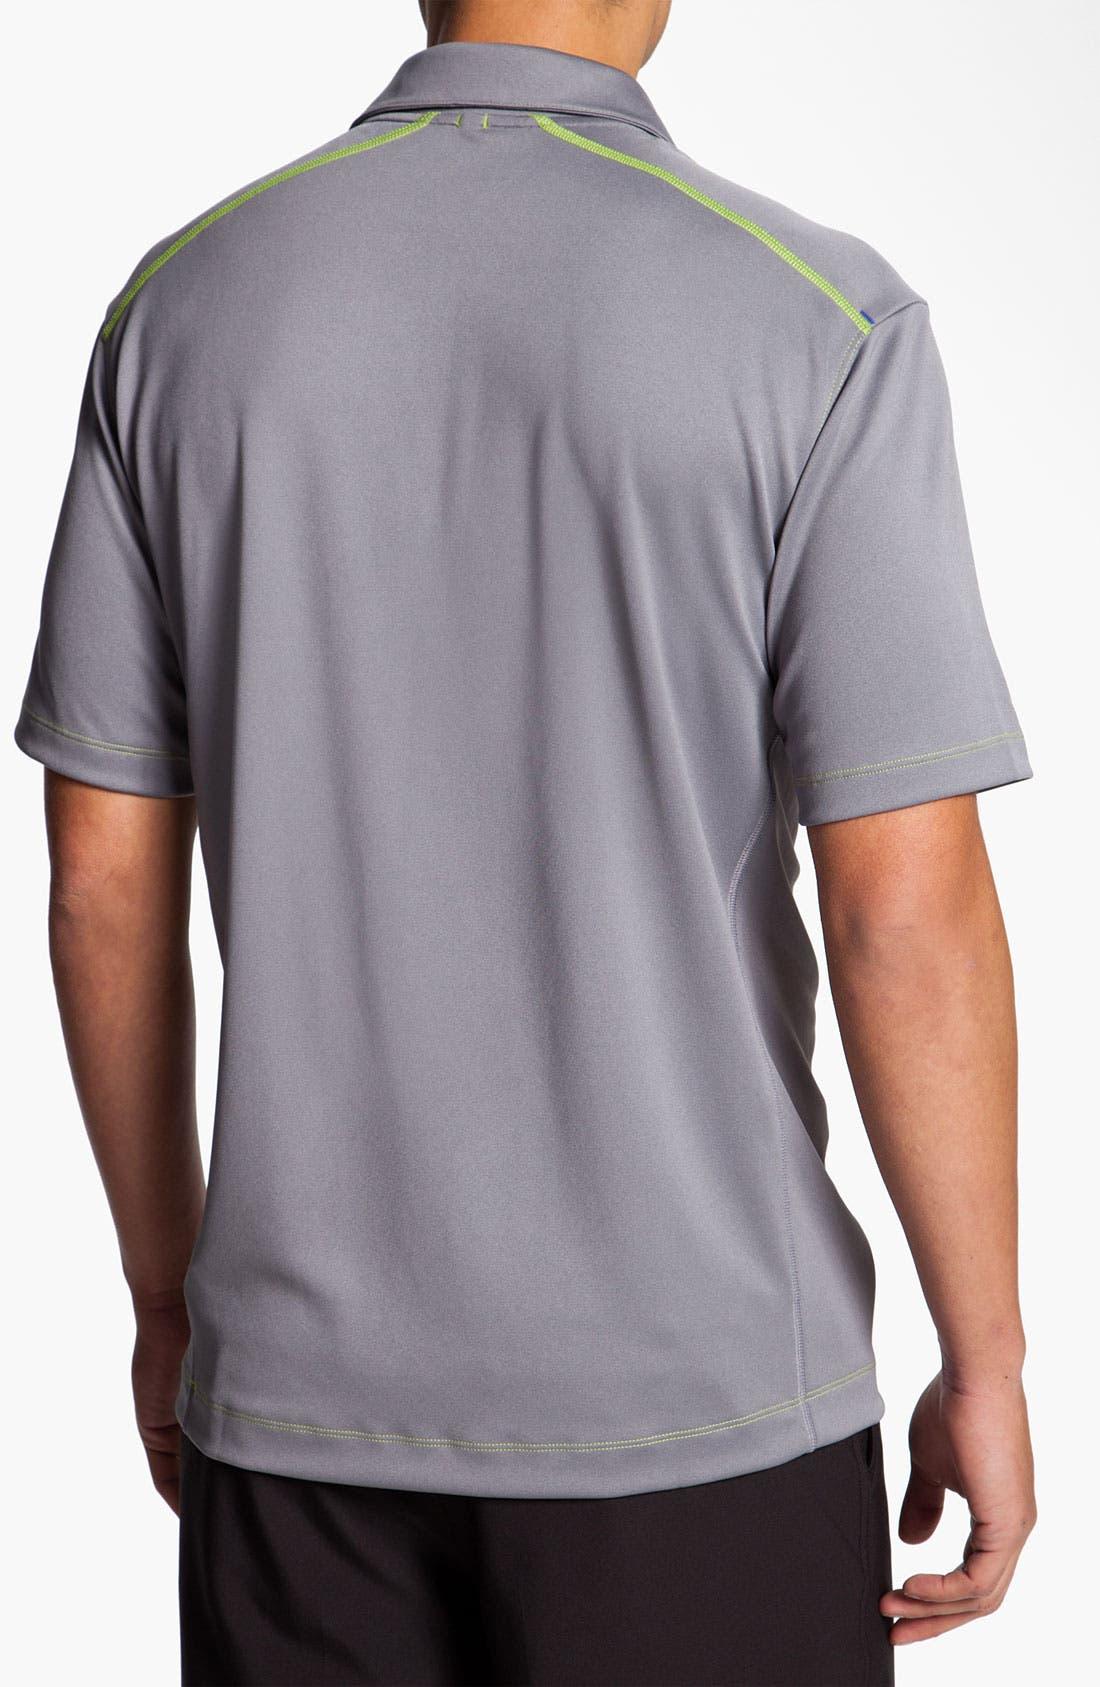 Alternate Image 2  - Nike Golf 'Herringbone Jacquard' Dri-FIT Polo